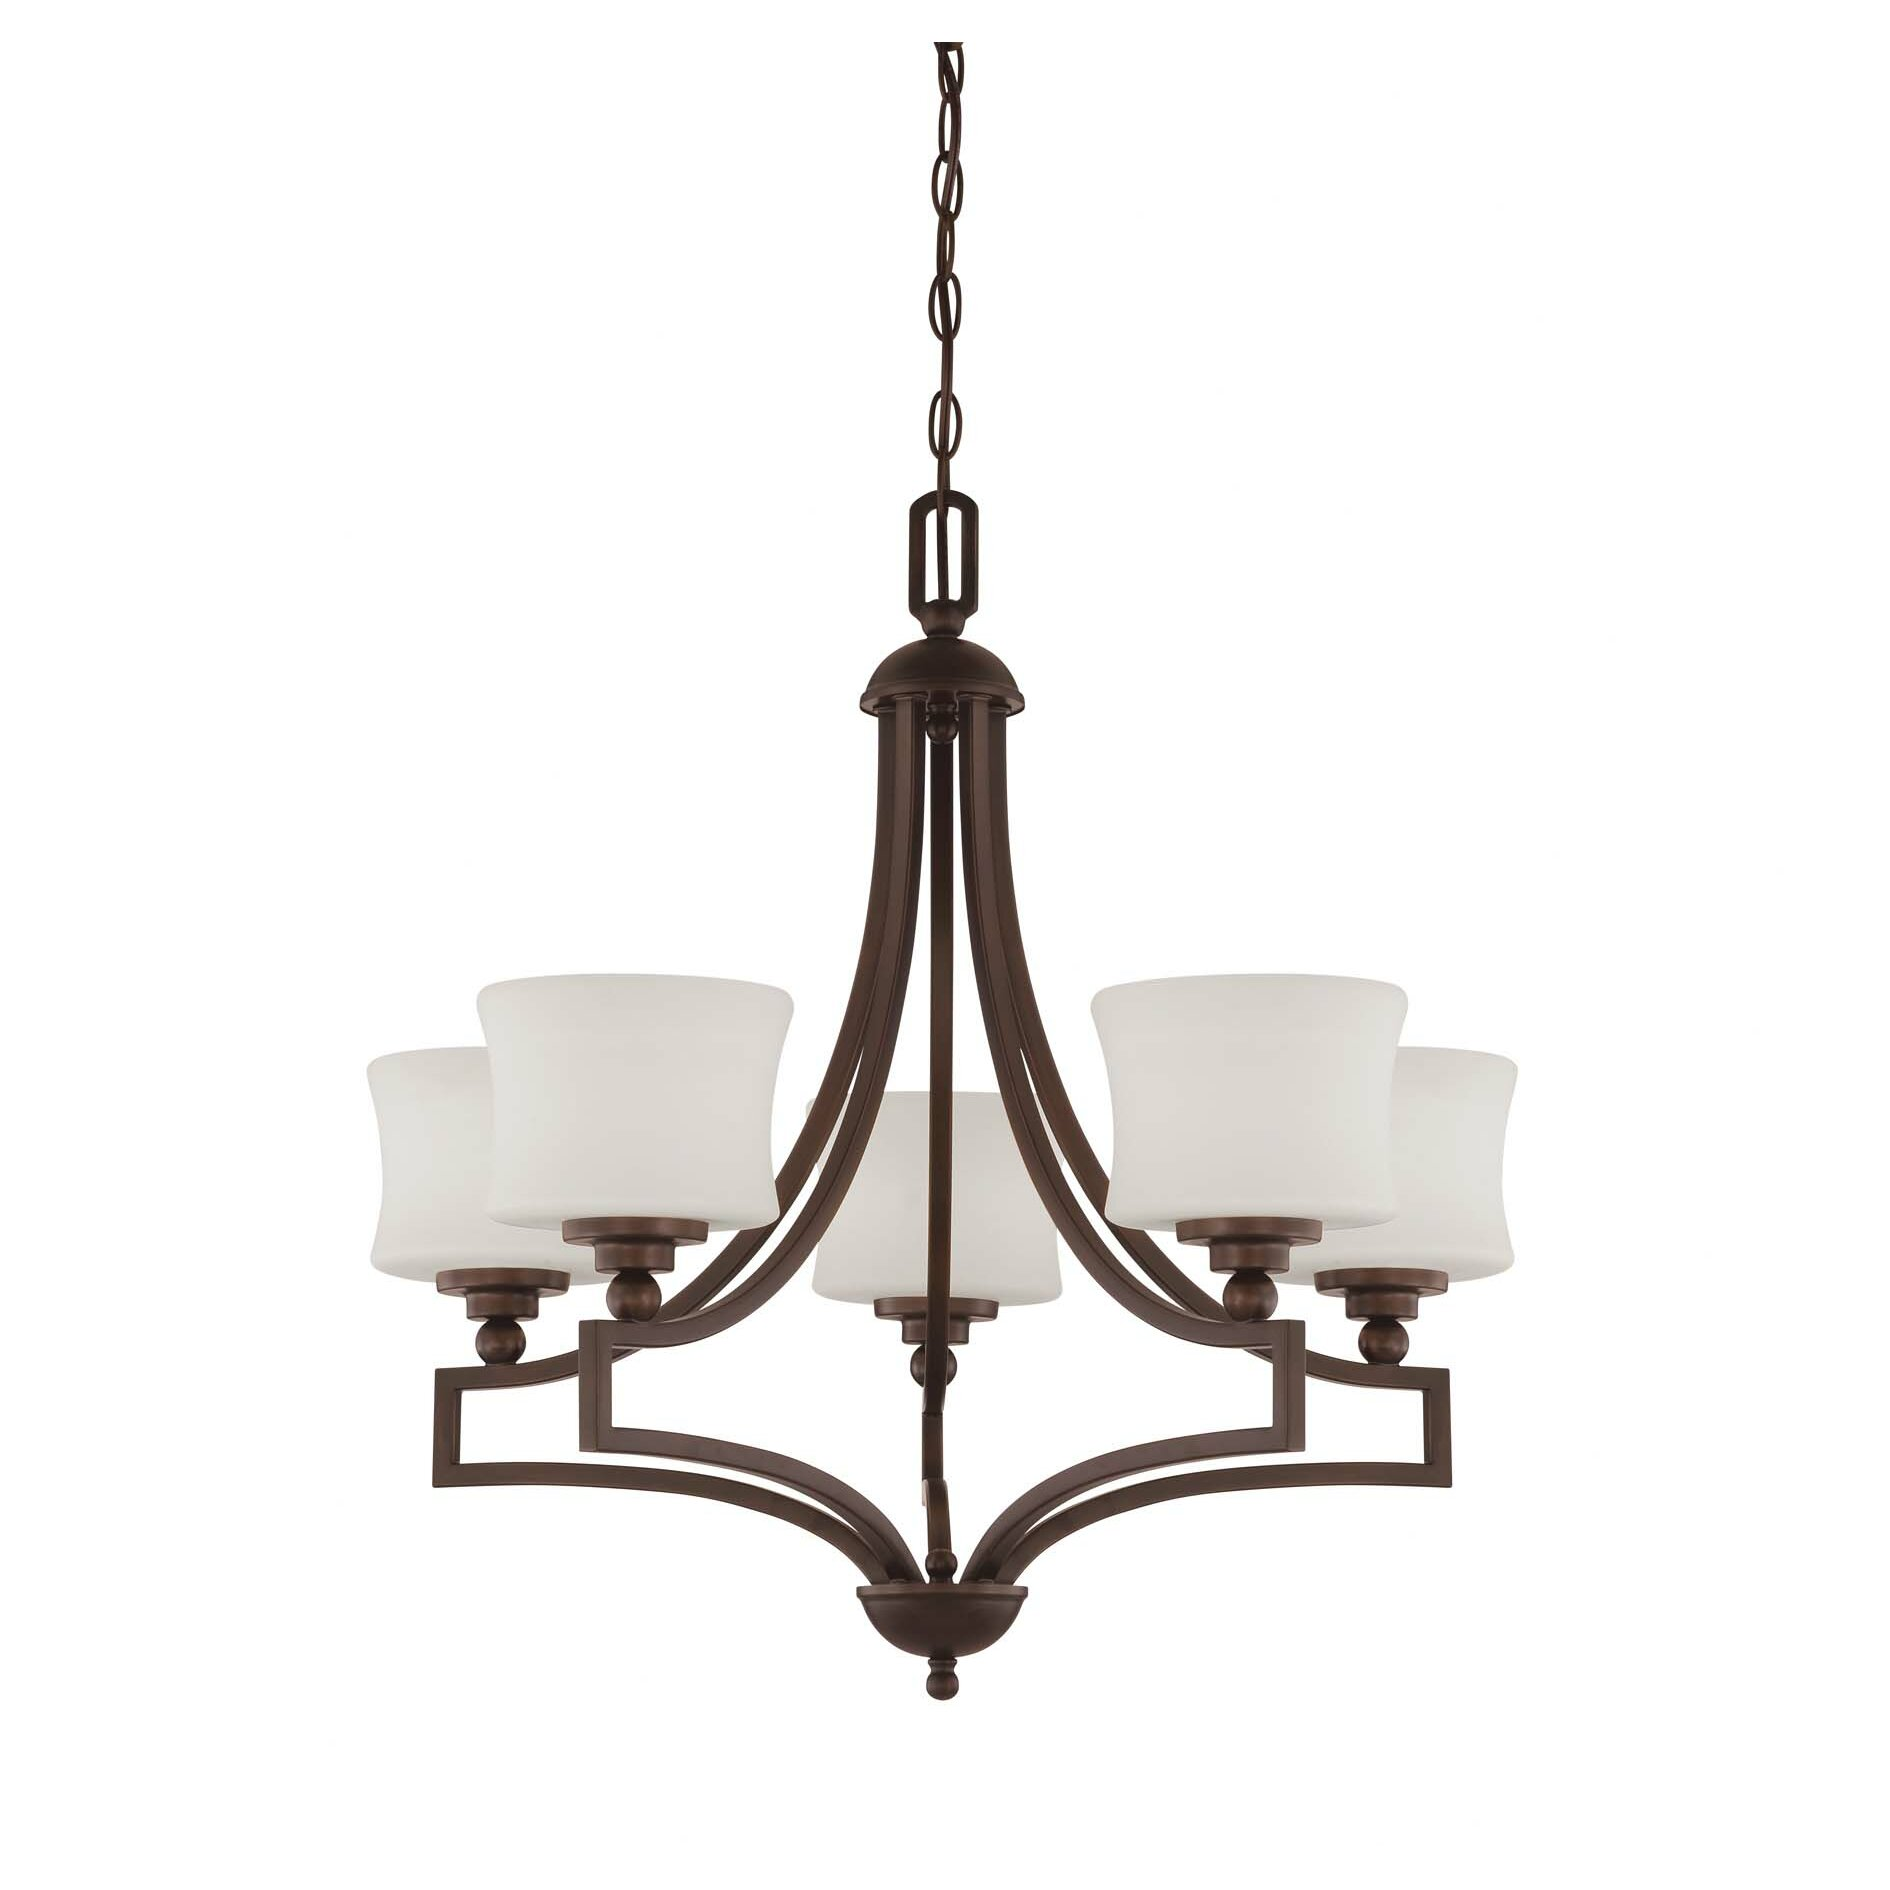 Savoy house terrell 5 light chandelier wayfair for Www savoyhouse com